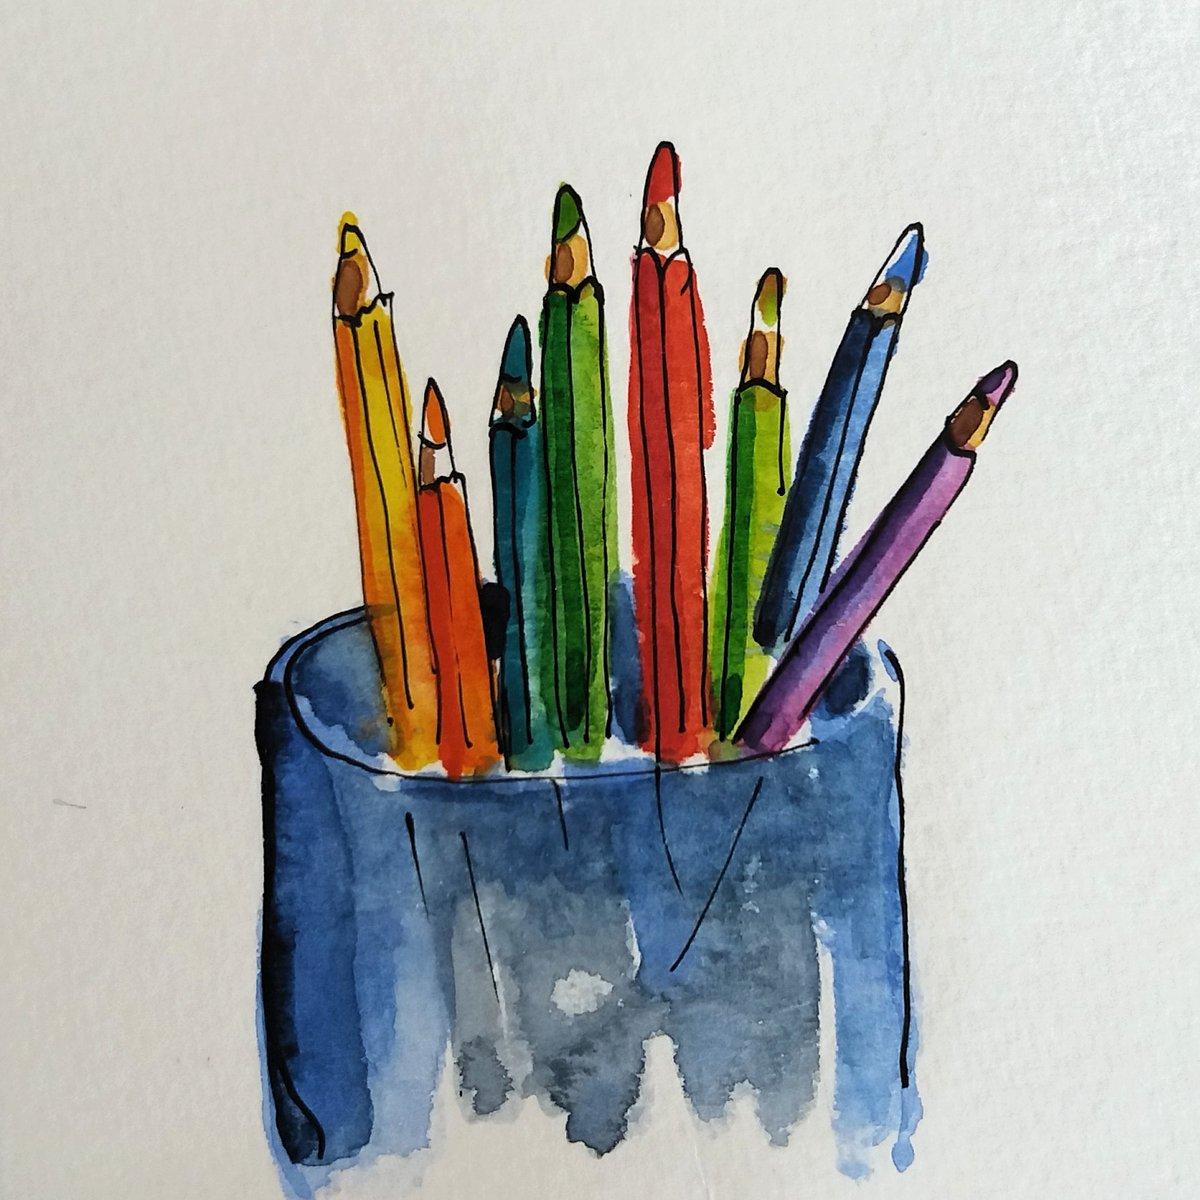 Coloured pencils. #sketchbook #watercolour #watercolor #watercolours #creativehabit #sketch #makearteveryday #inkandwatercolour #watercoloursketchpic.twitter.com/CNDdyRXPjr